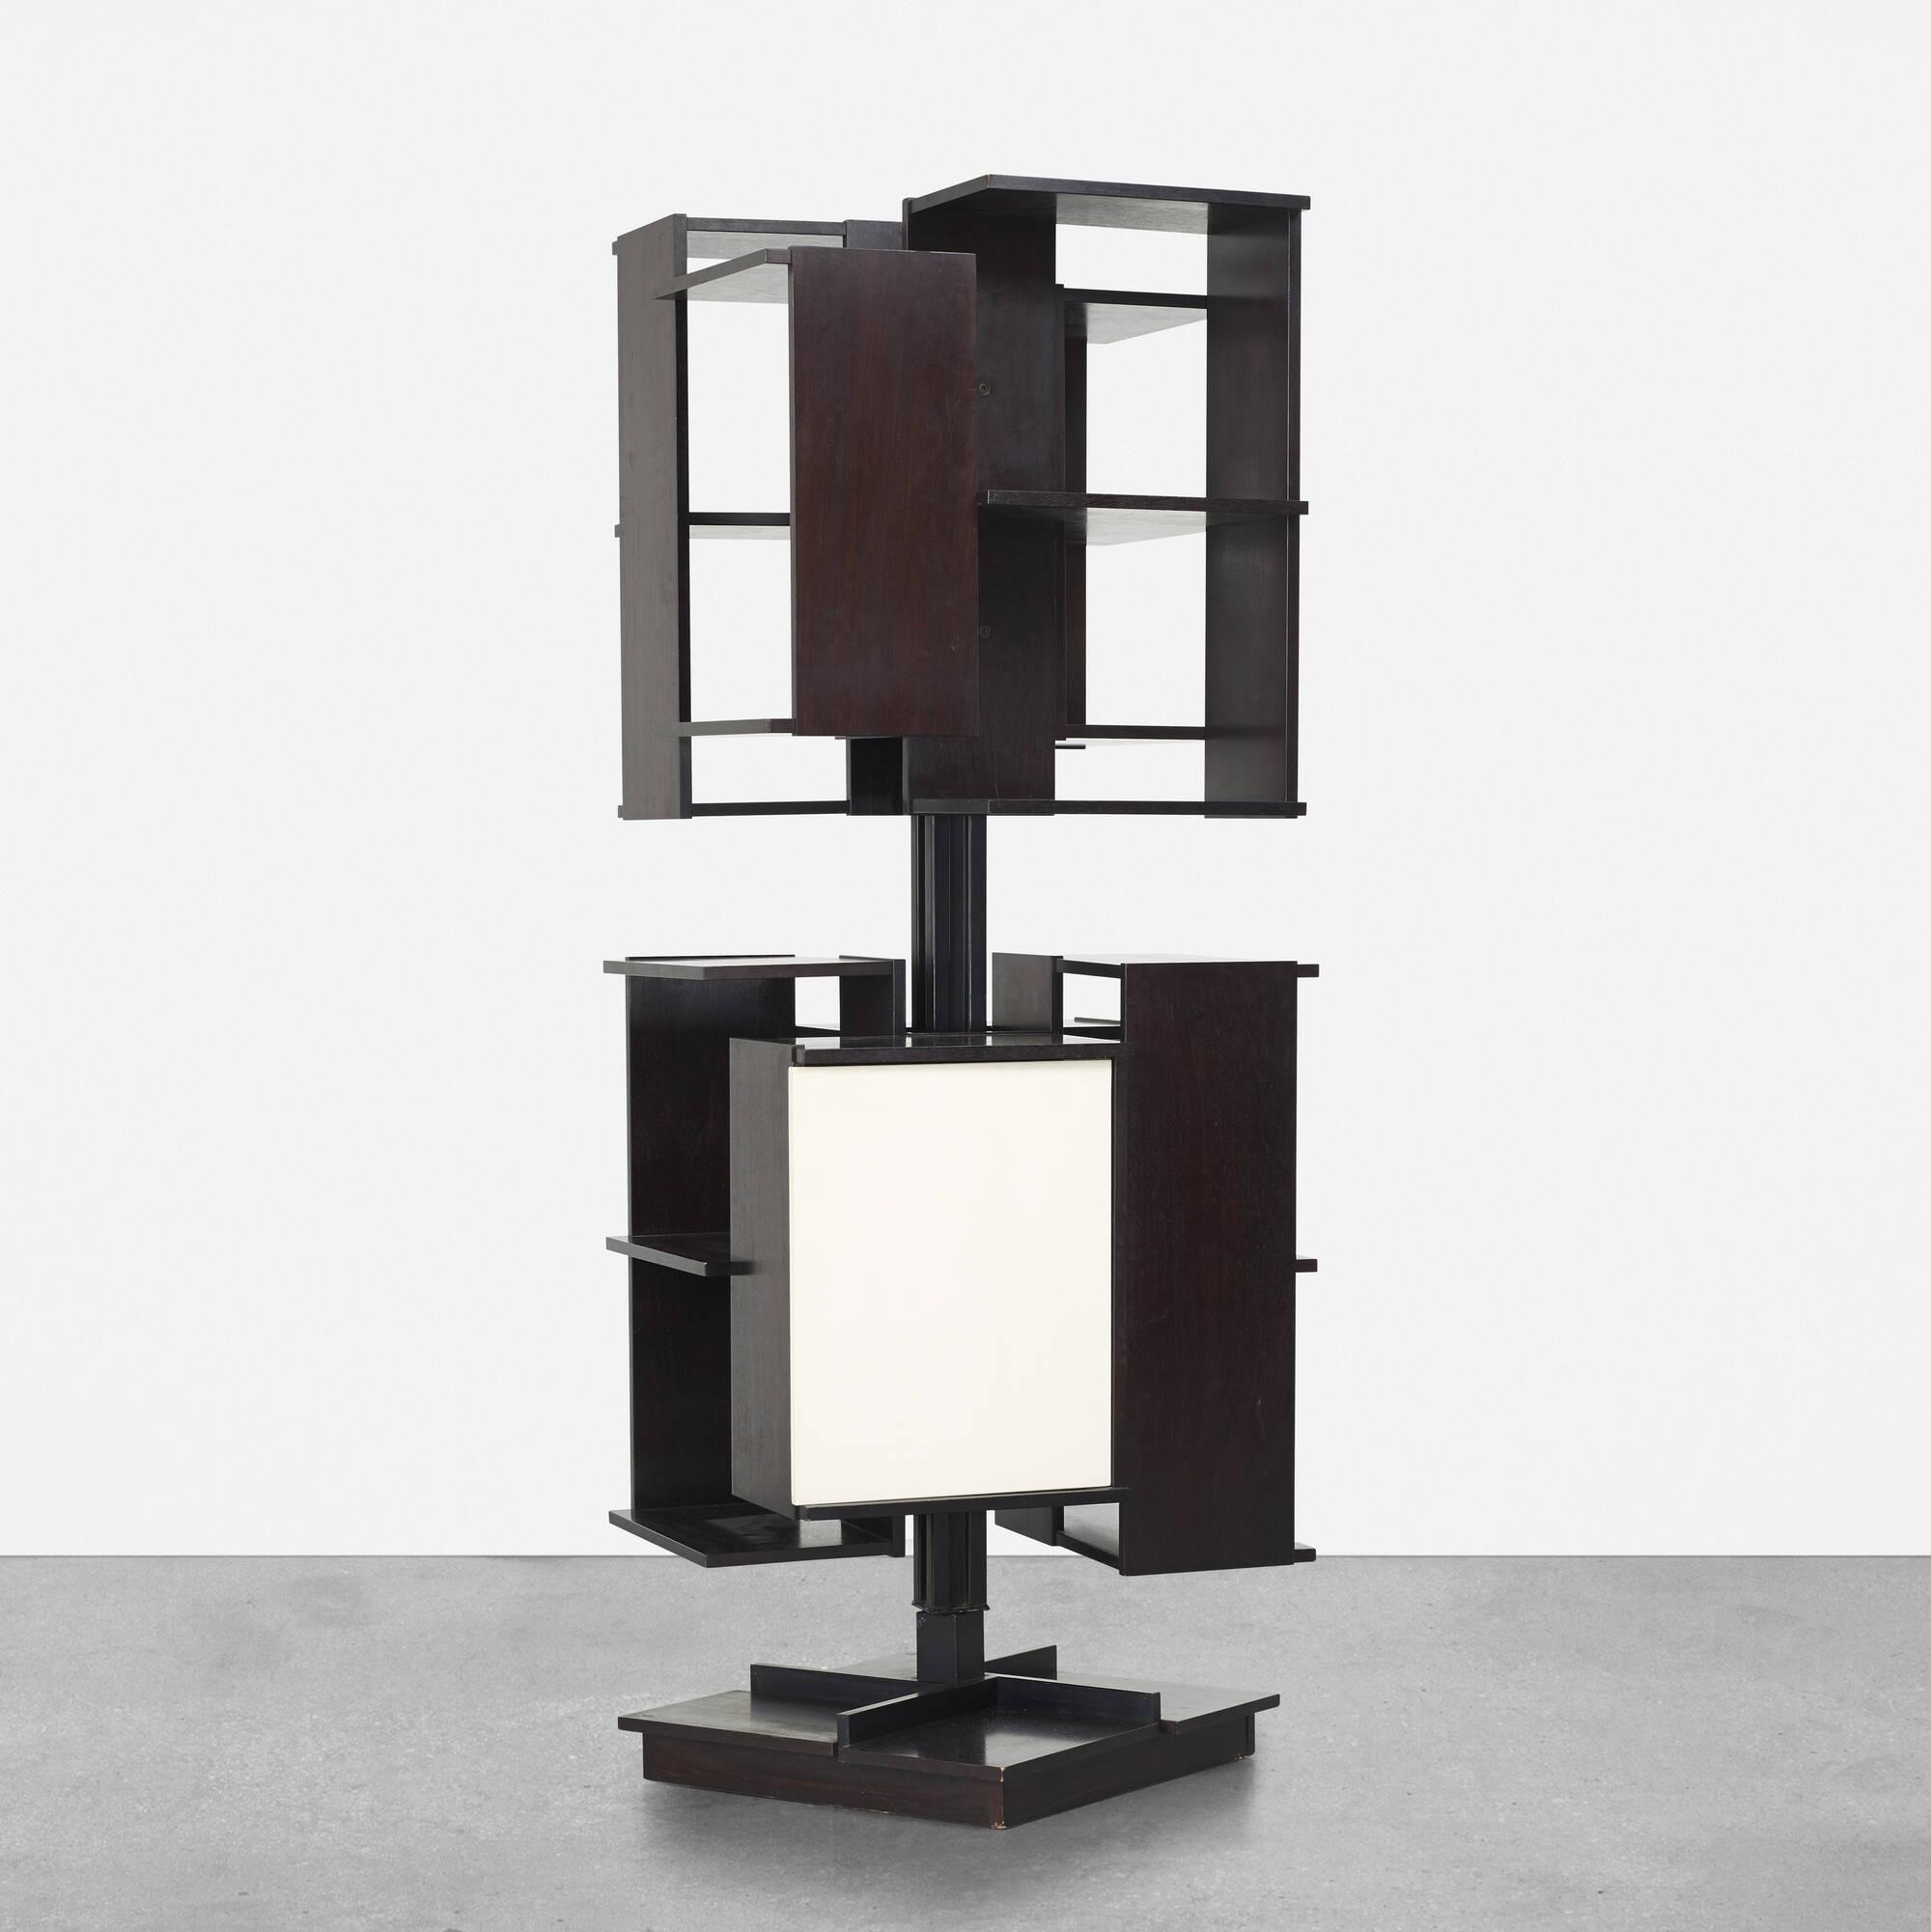 321: Claudio Salocchi / Centro bookcase (1 of 1)